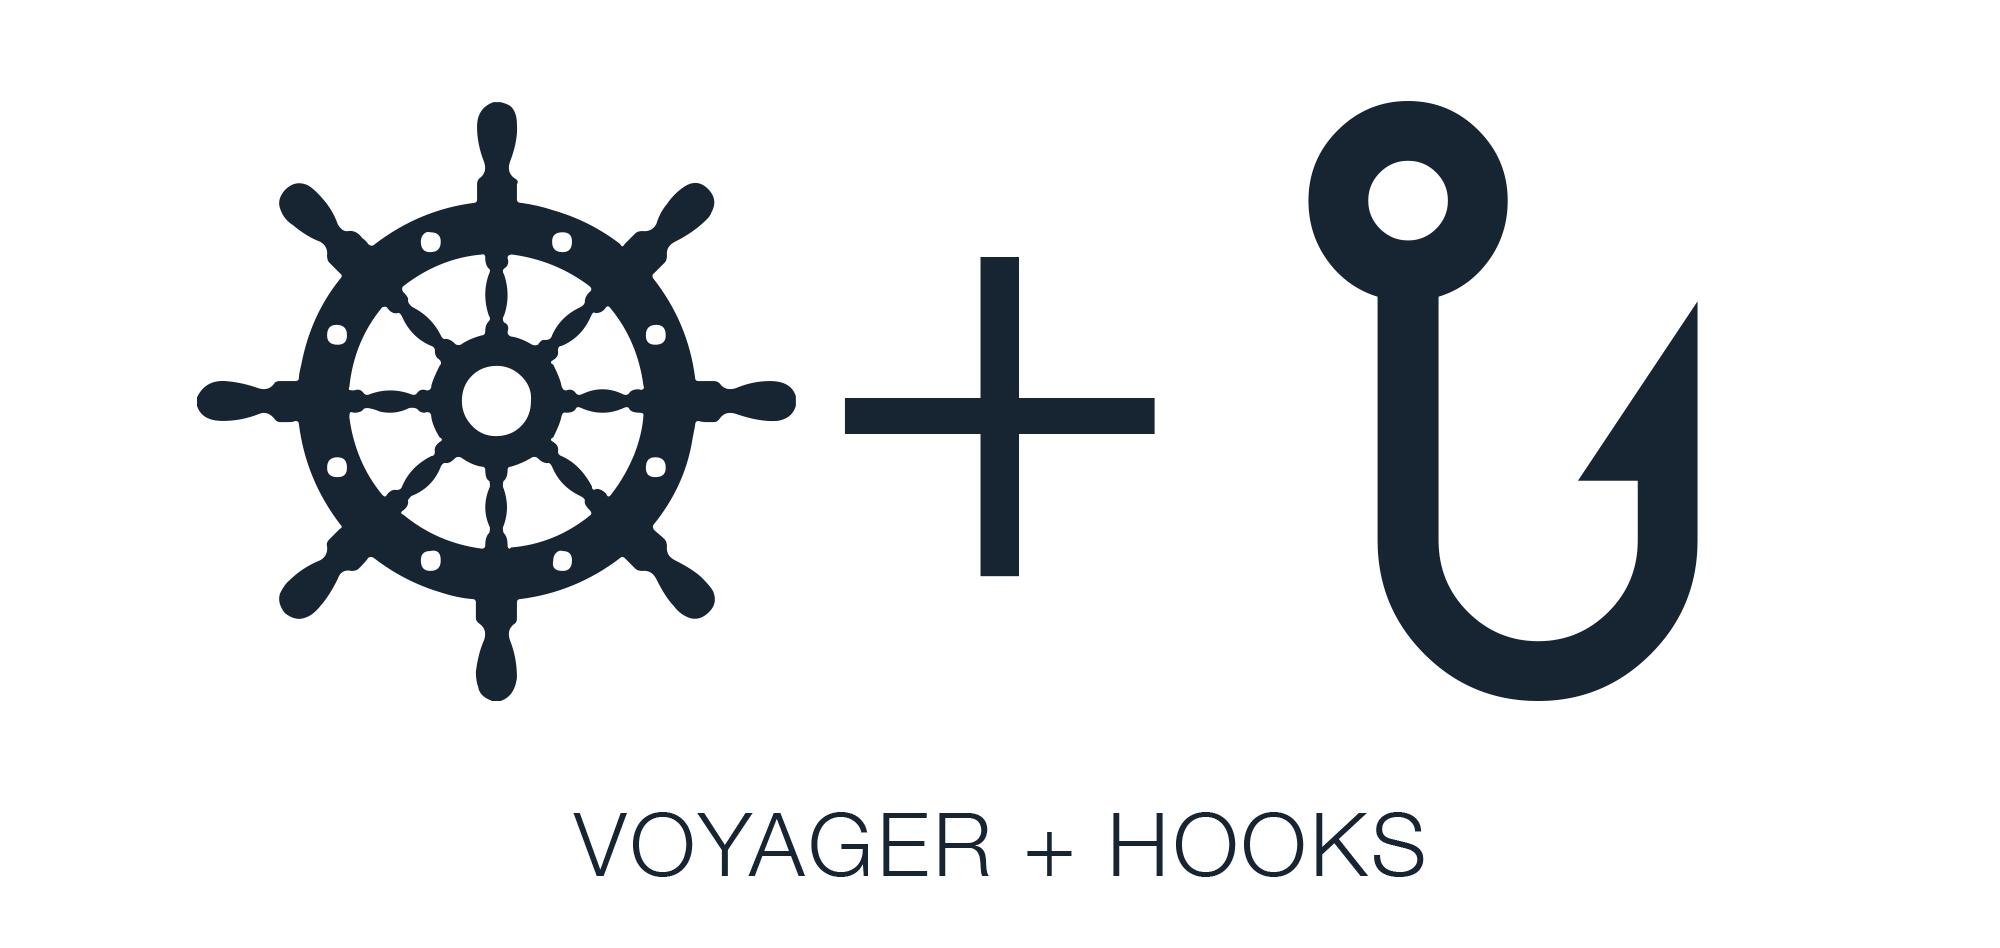 Voyager Hooks